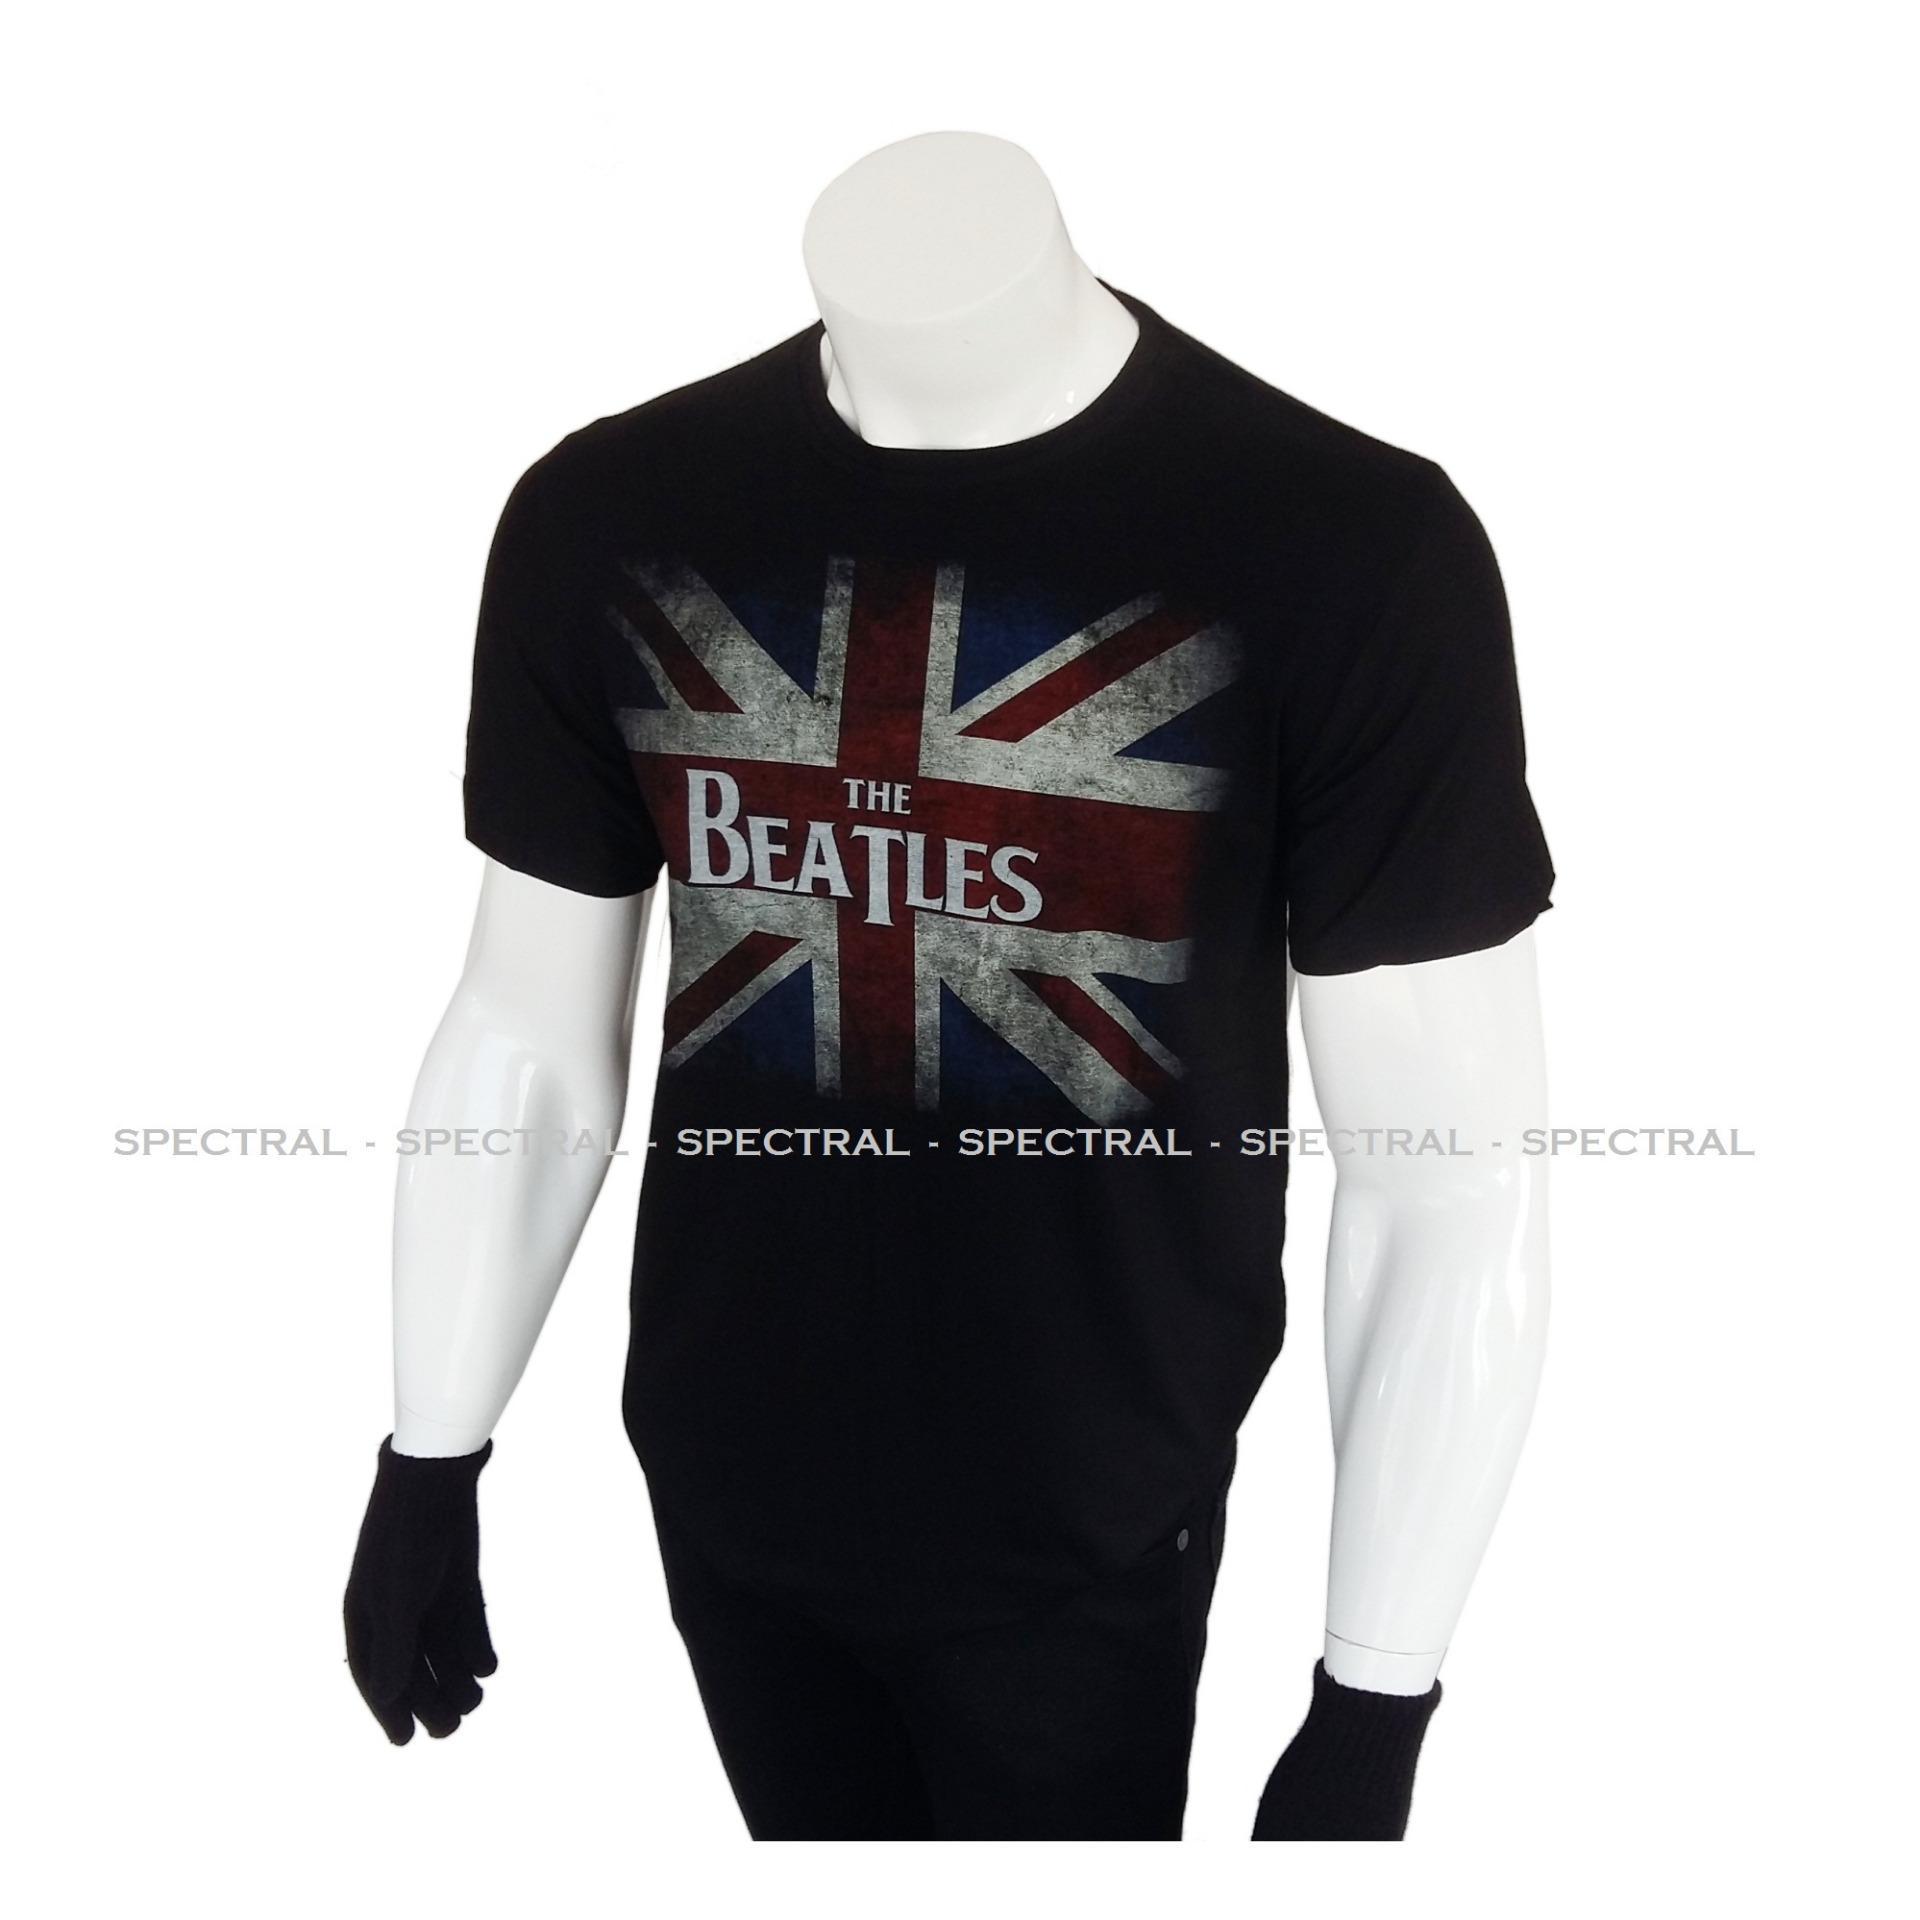 Spectral - Kaos Distro Kaos Fashion Soft Rayon Viscose Spandex T-Shirt .